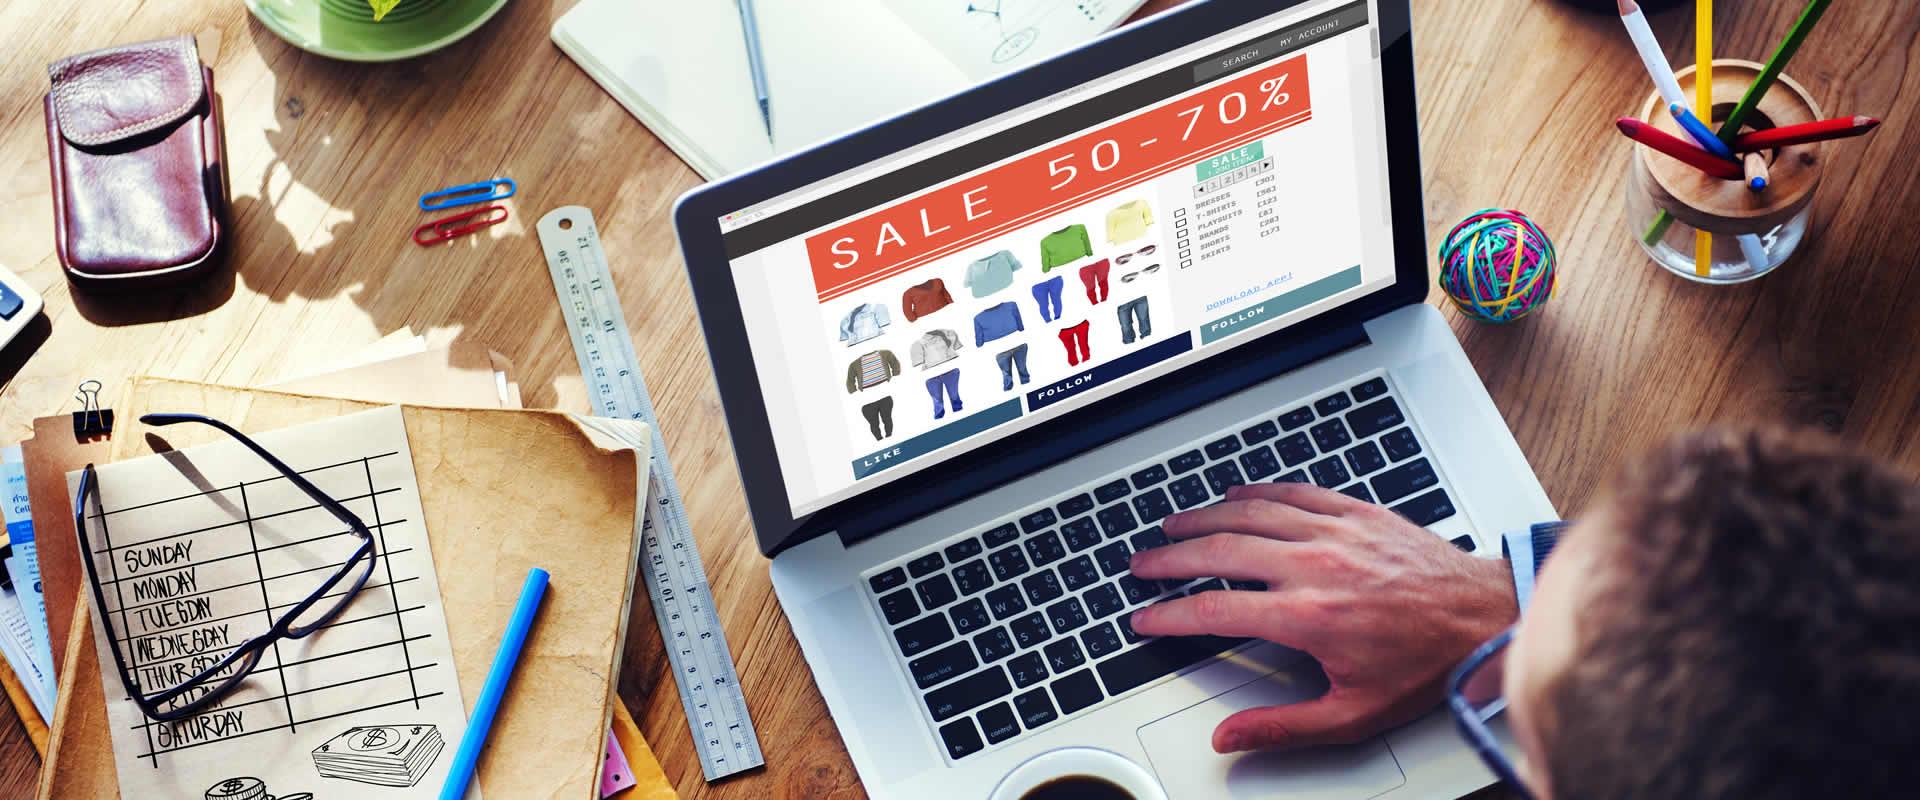 clayton-nc-web-design-ecommerce-design